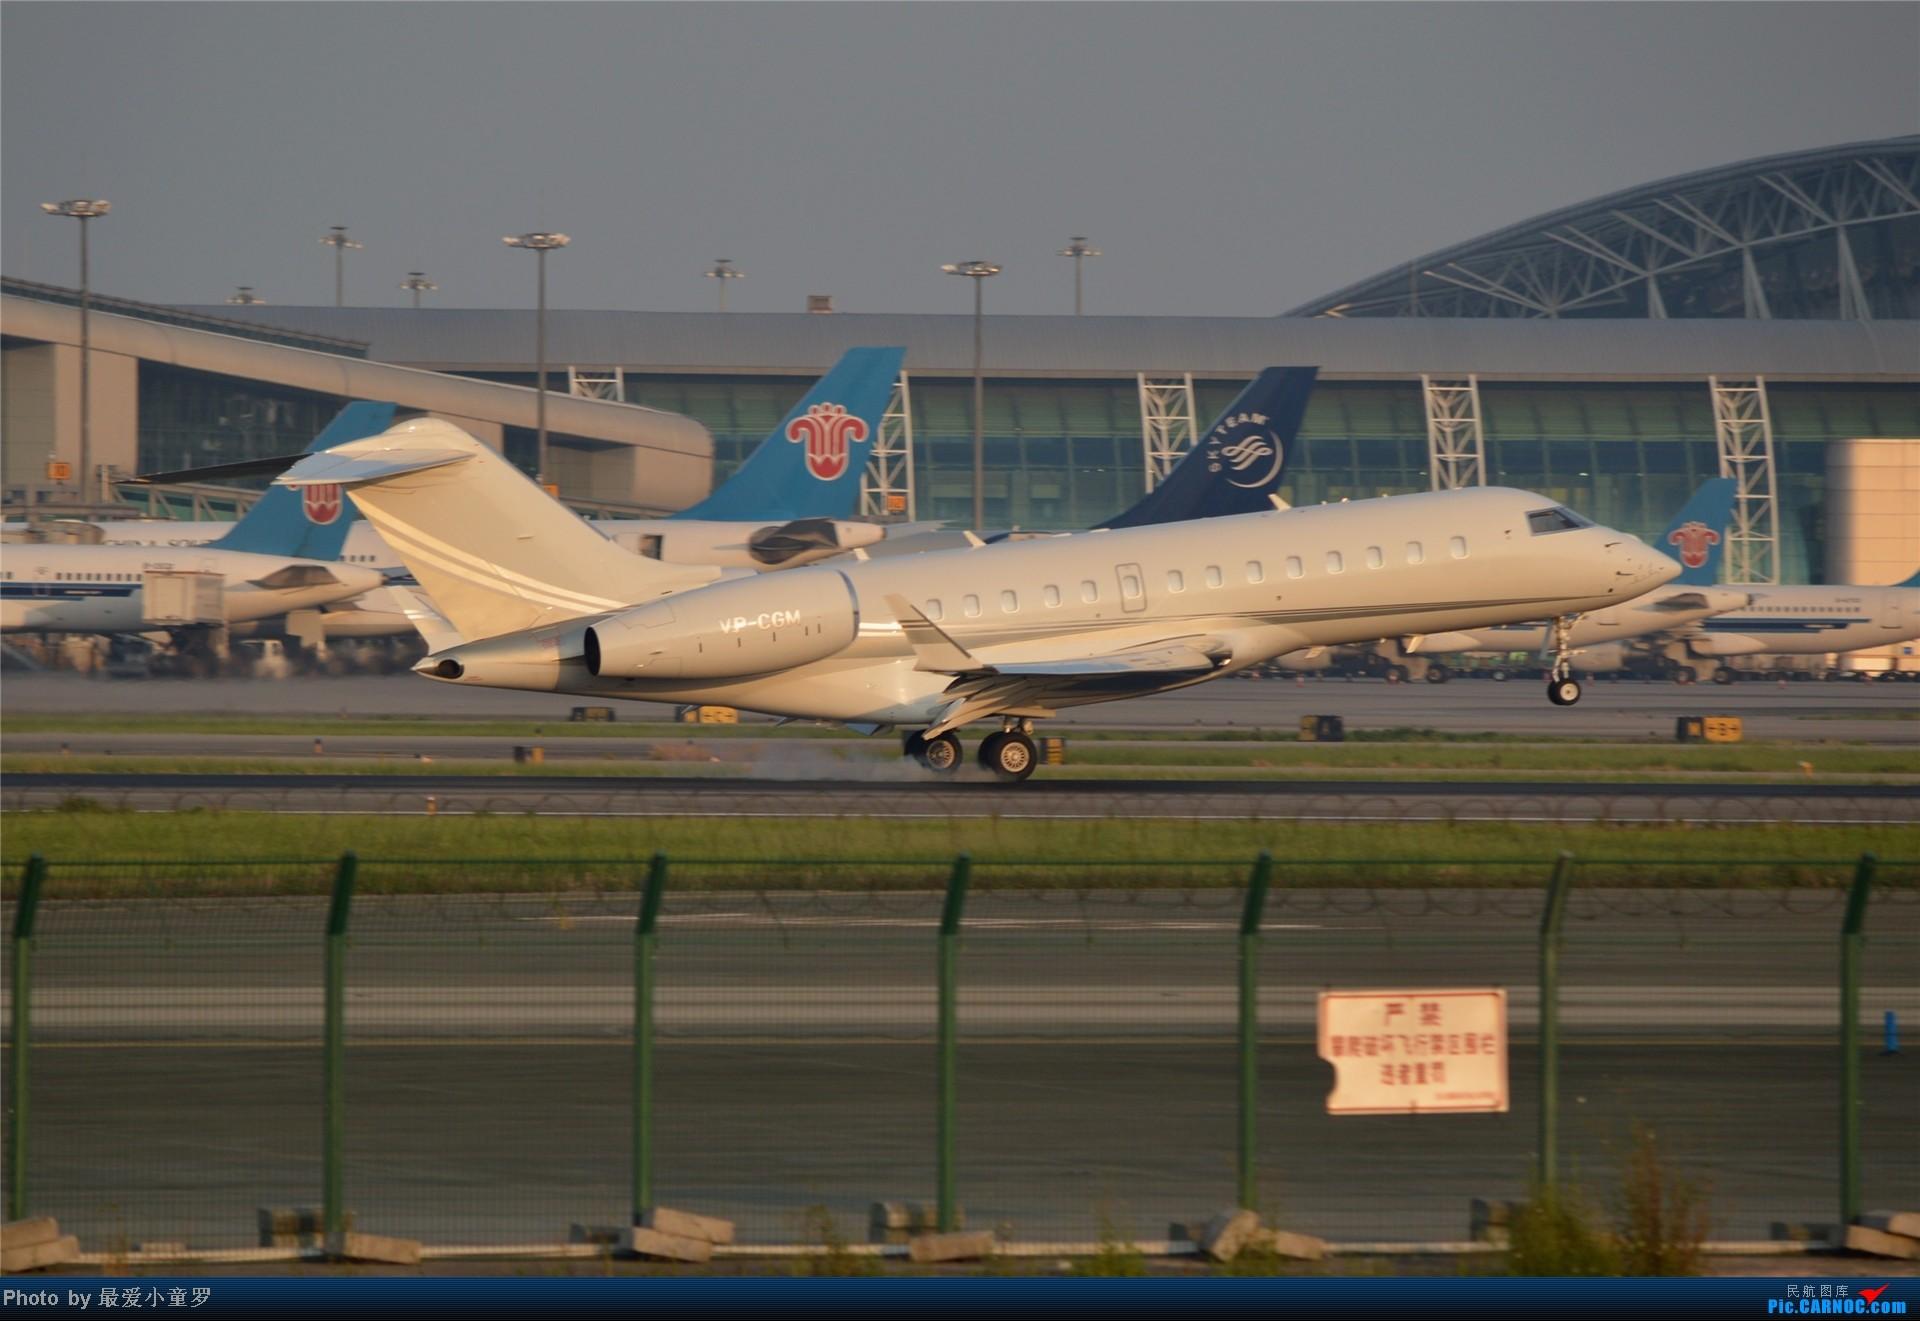 Re:[原创]炒冷饭贴之13年10月2日CAN拍机杂图系列 UNKOWN VP-CGM 中国广州白云机场